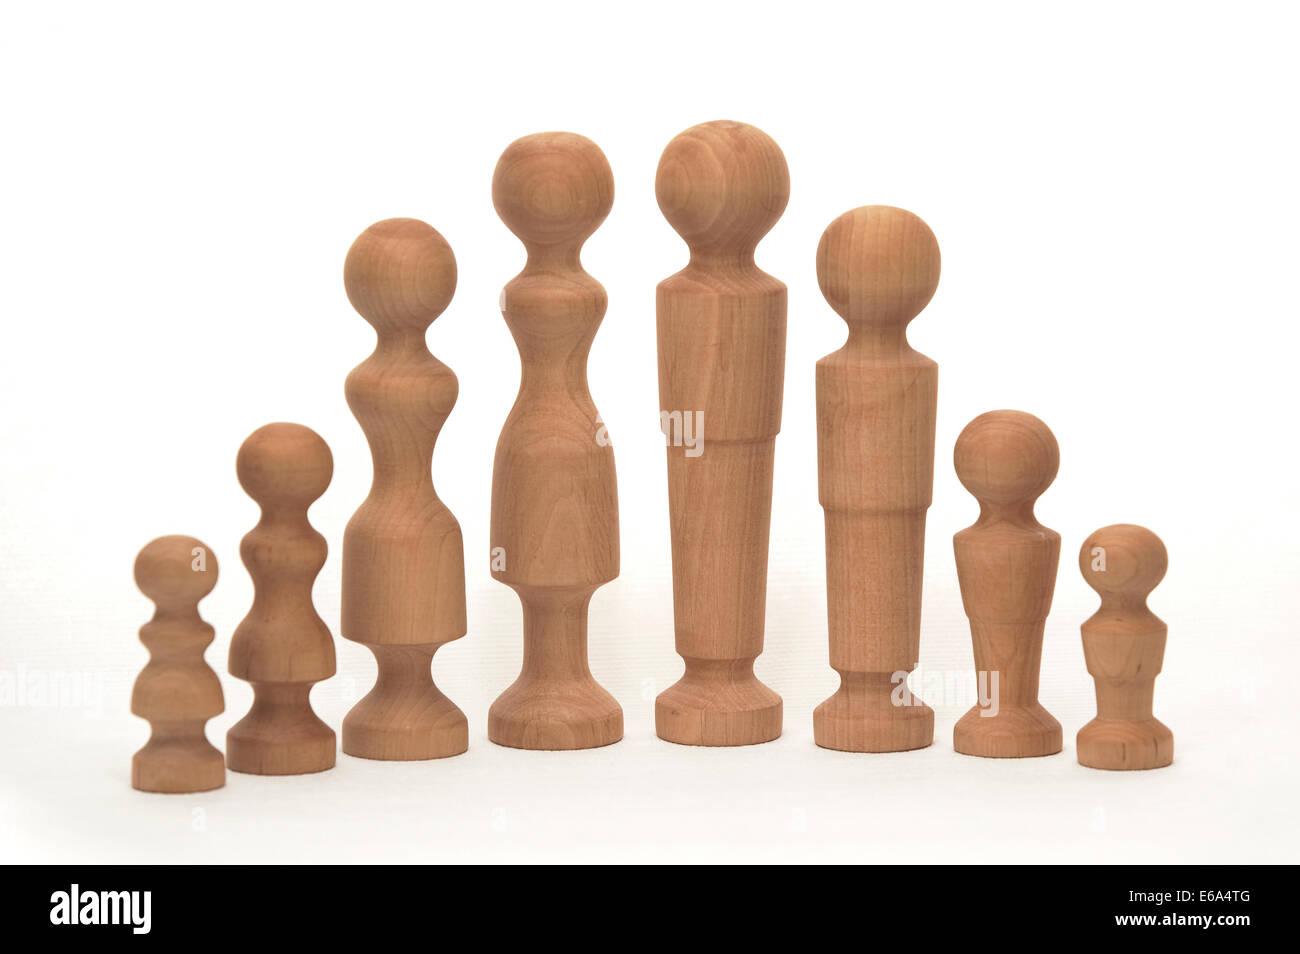 wooden figure,family,extended family - Stock Image